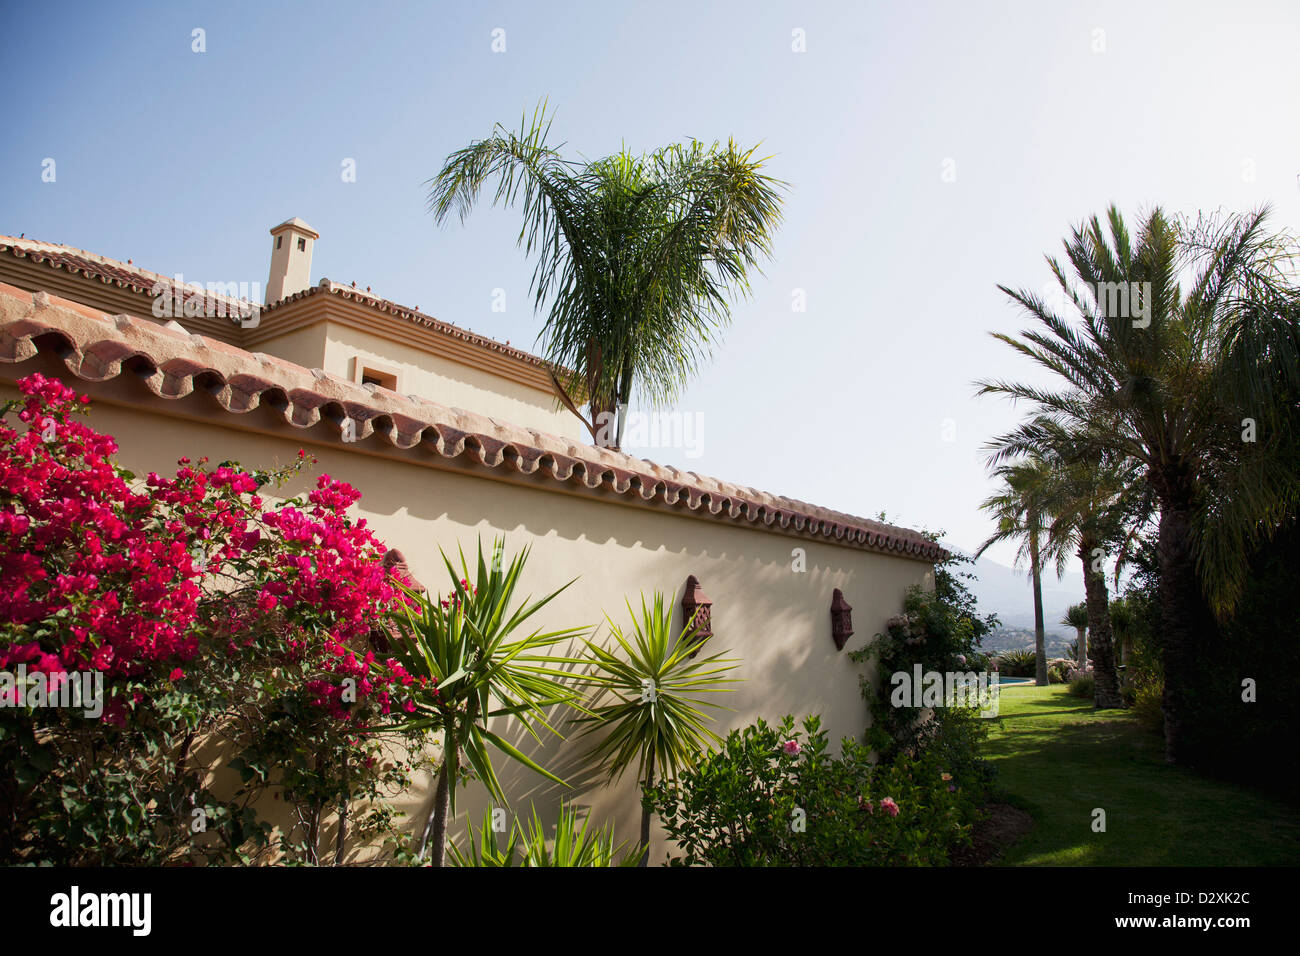 Spanish villa - Stock Image